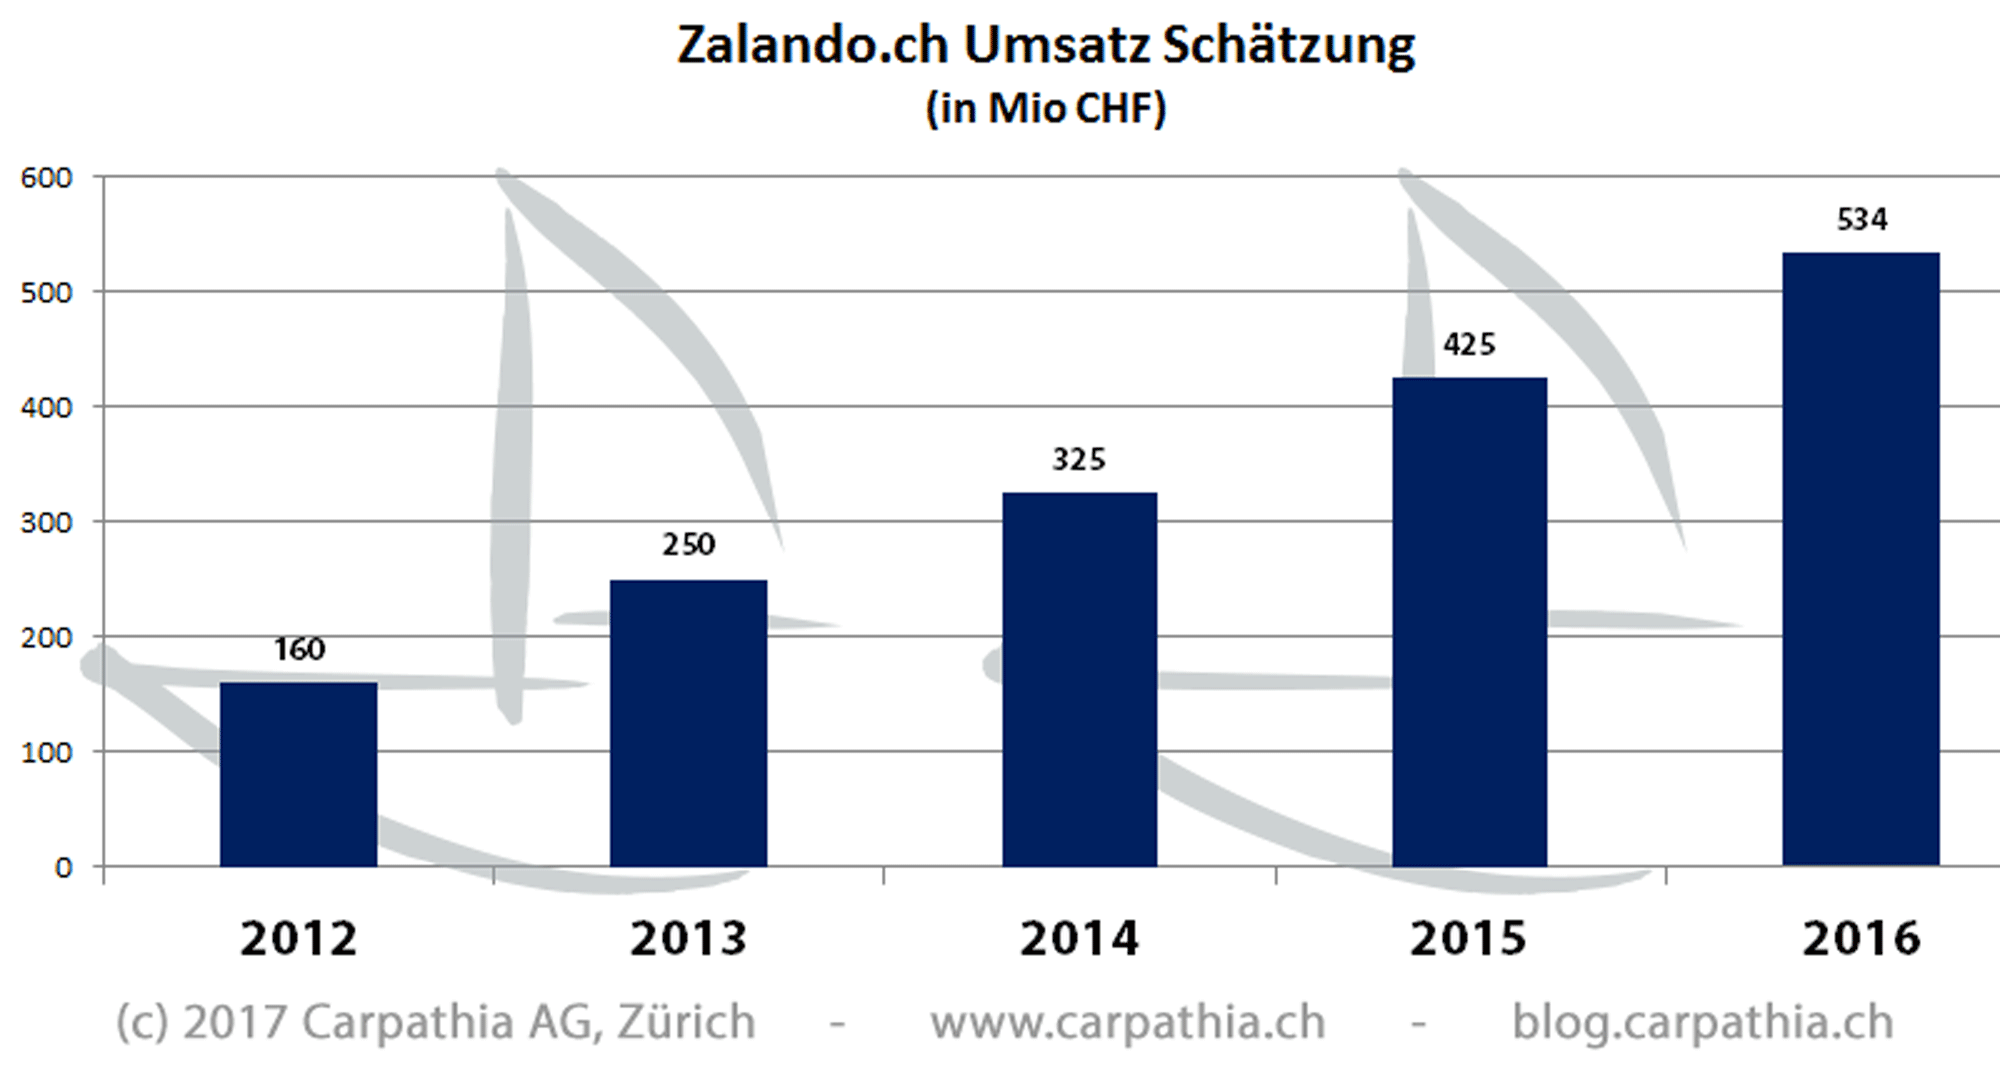 Schätzung Umsätze Zalando Schweiz 2012-2016 - Quelle: Carpathia AG